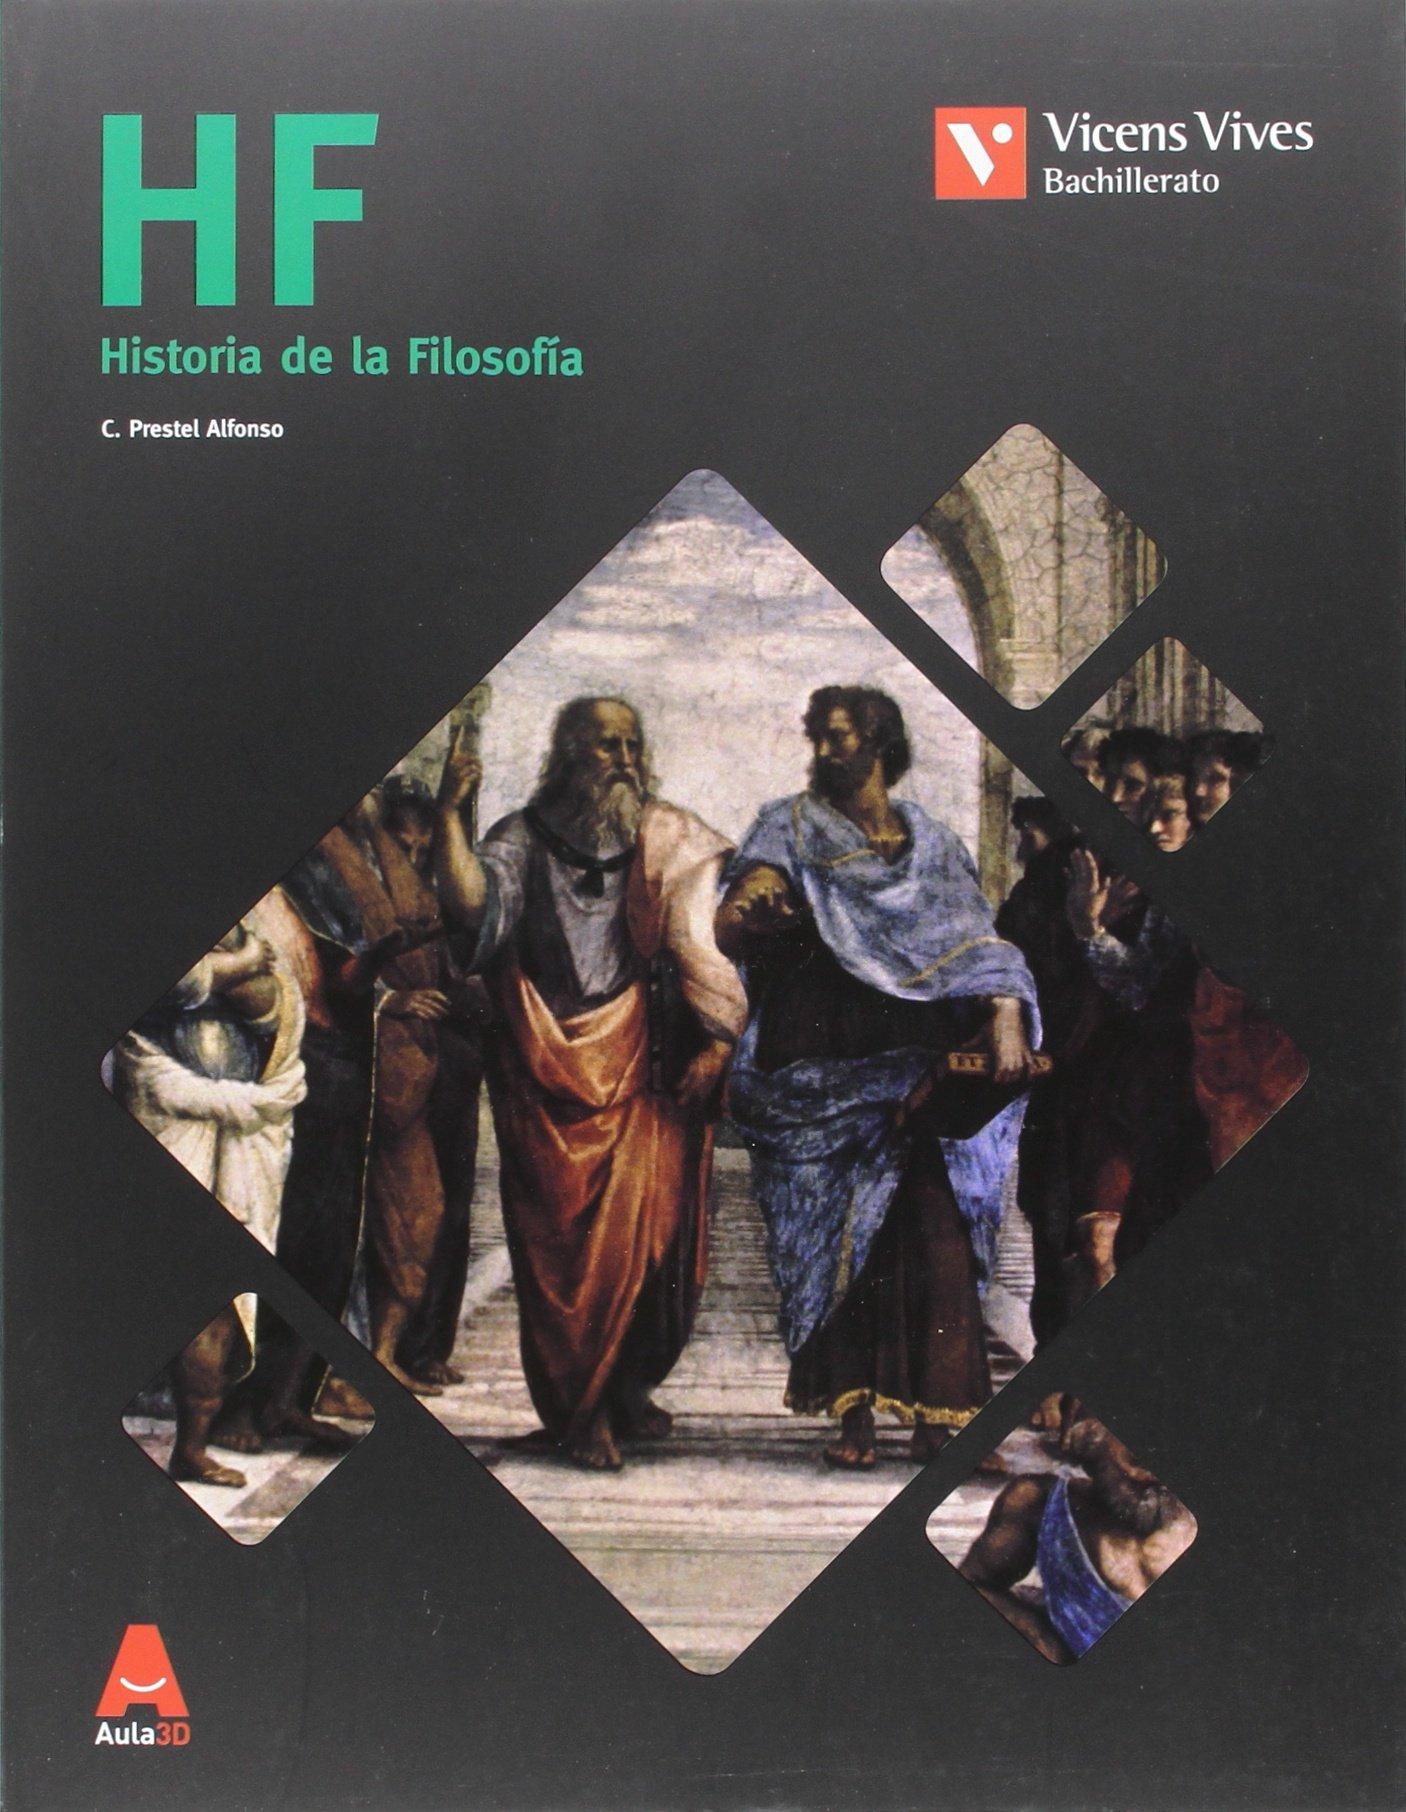 HF Historia de la Filosofía Bachillerato. Aula 3D: 000001 ...